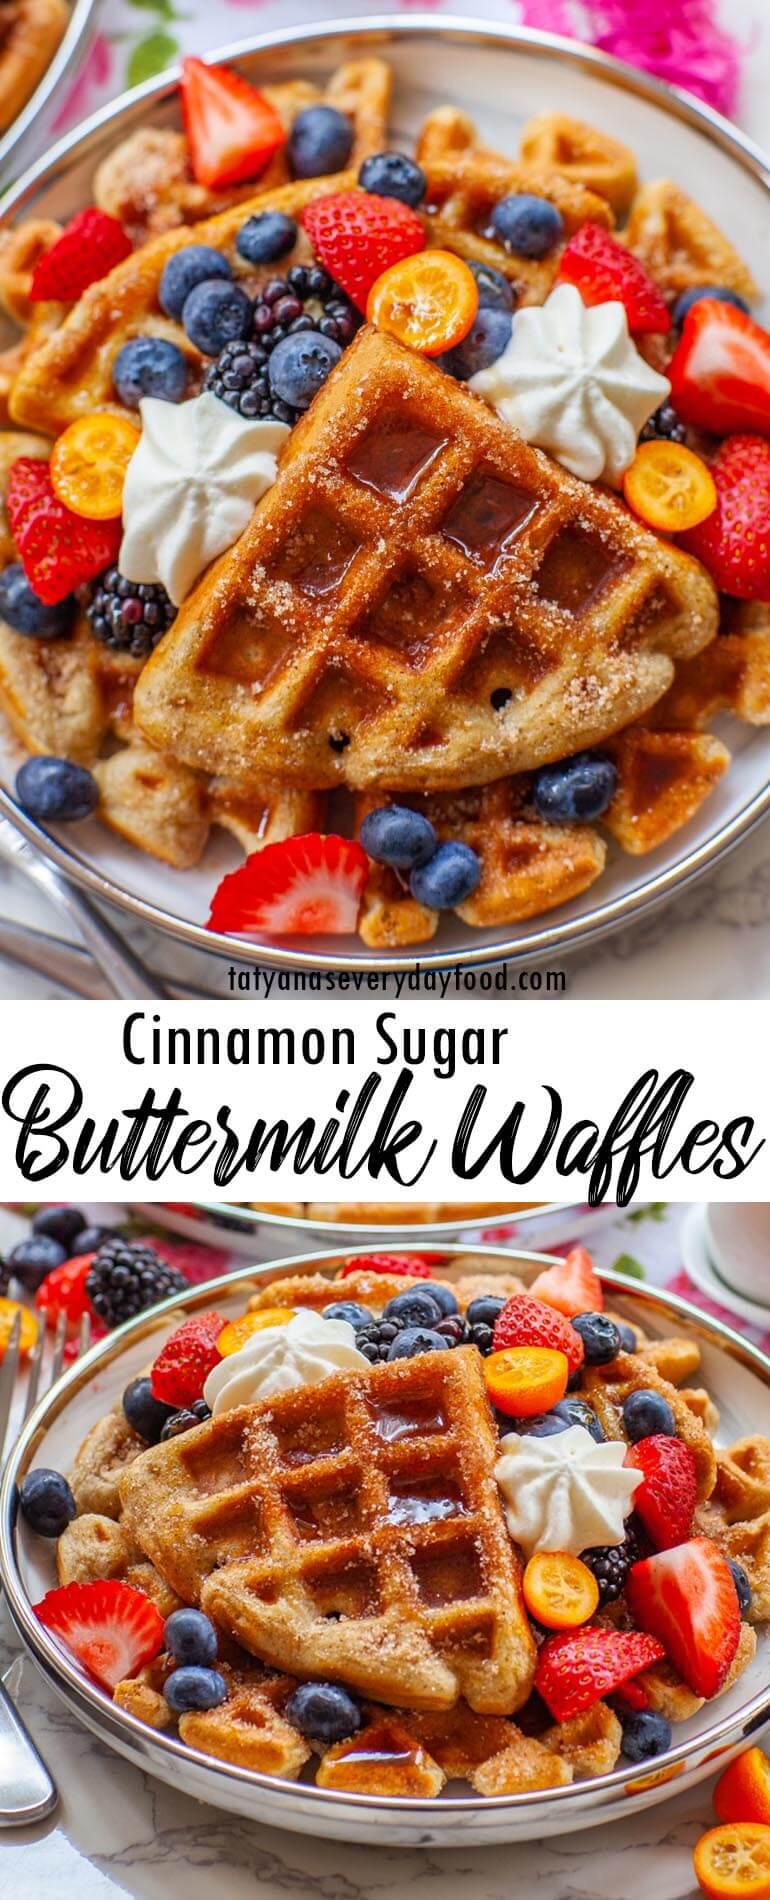 Cinnamon Sugar Buttermilk Waffles video recipe